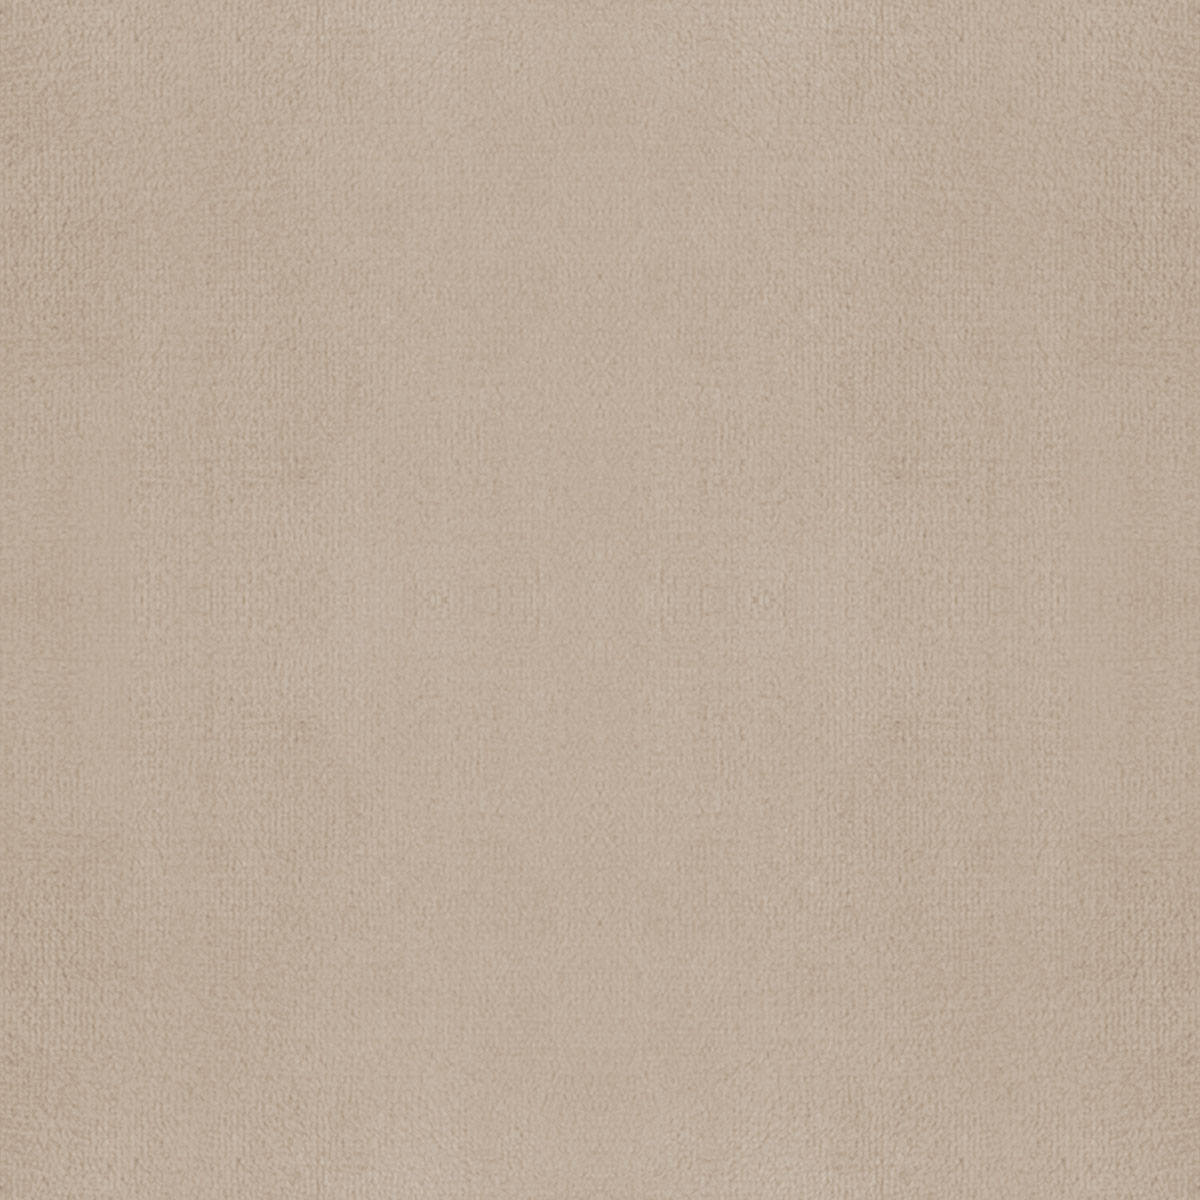 ... Sunbeam® Full/Queen RoyalMink™ Heated Blanket, ...